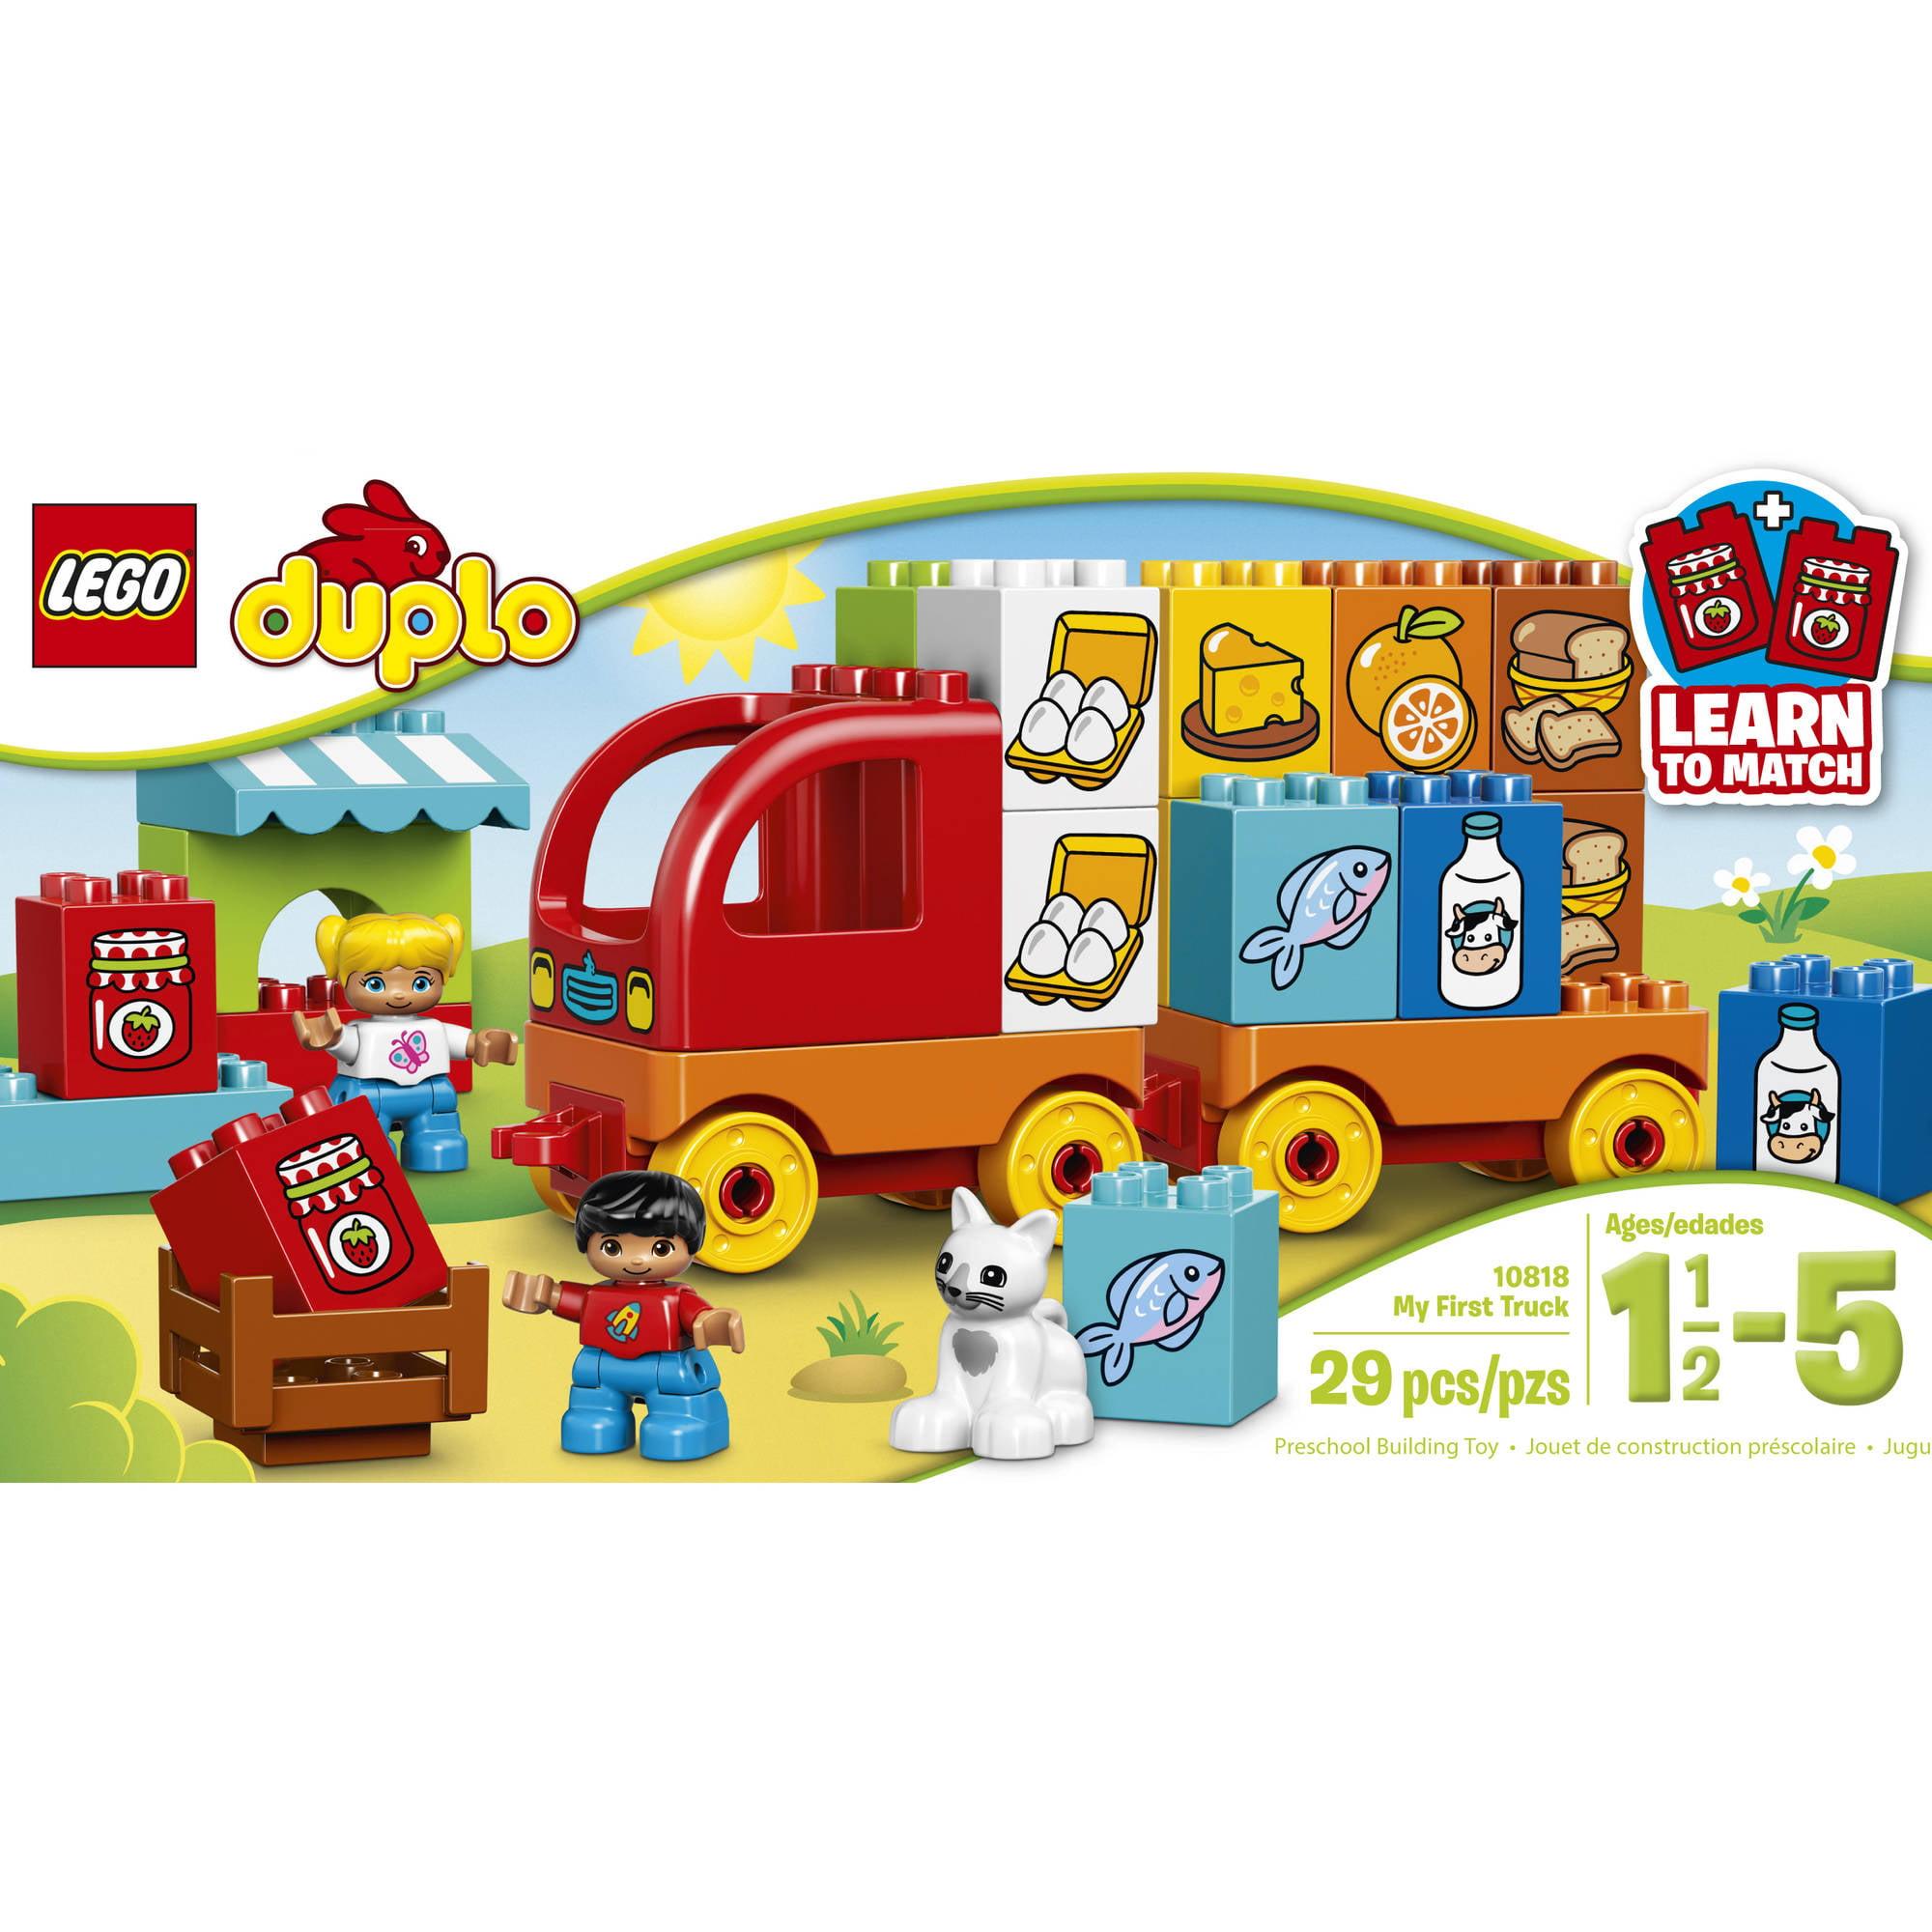 Lego Duplo My First My First Truck 10818 Walmartcom